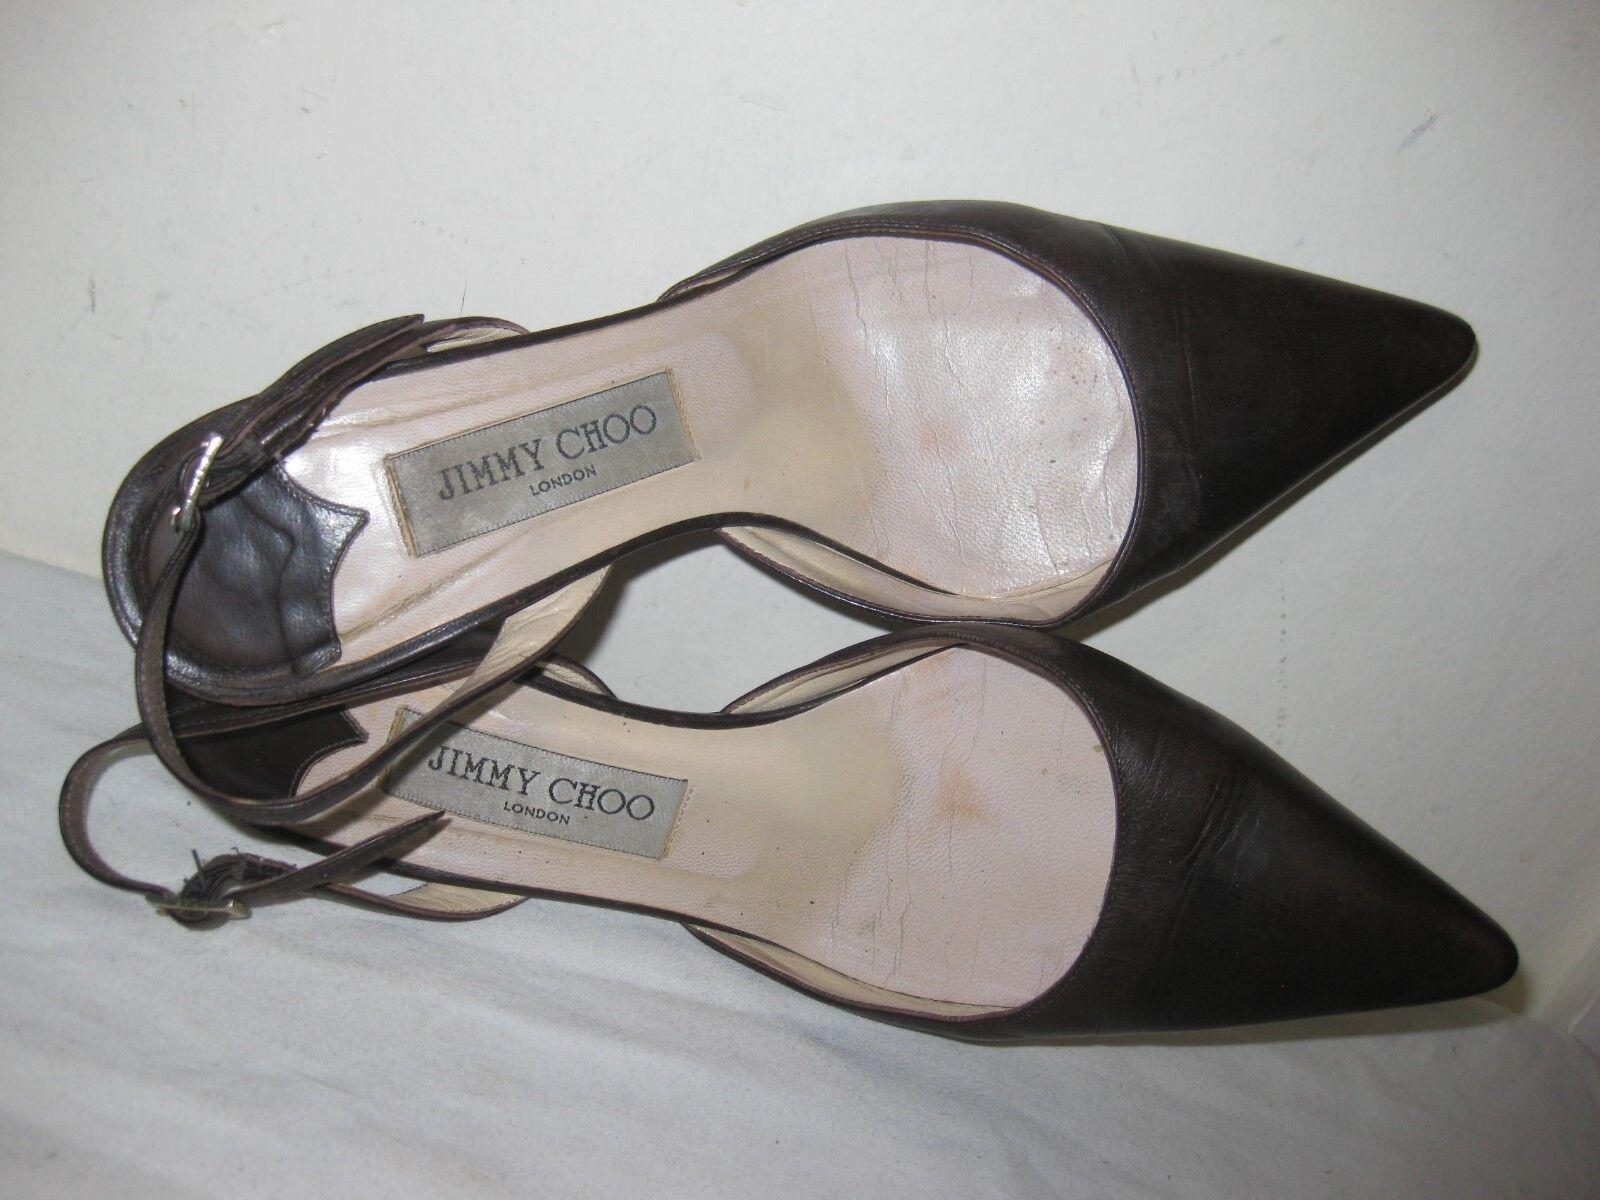 Jimmy Choo Blrown Leder Slingback Heels 7.5 Schuhes Größe 38 / 7.5 Heels 82fab2